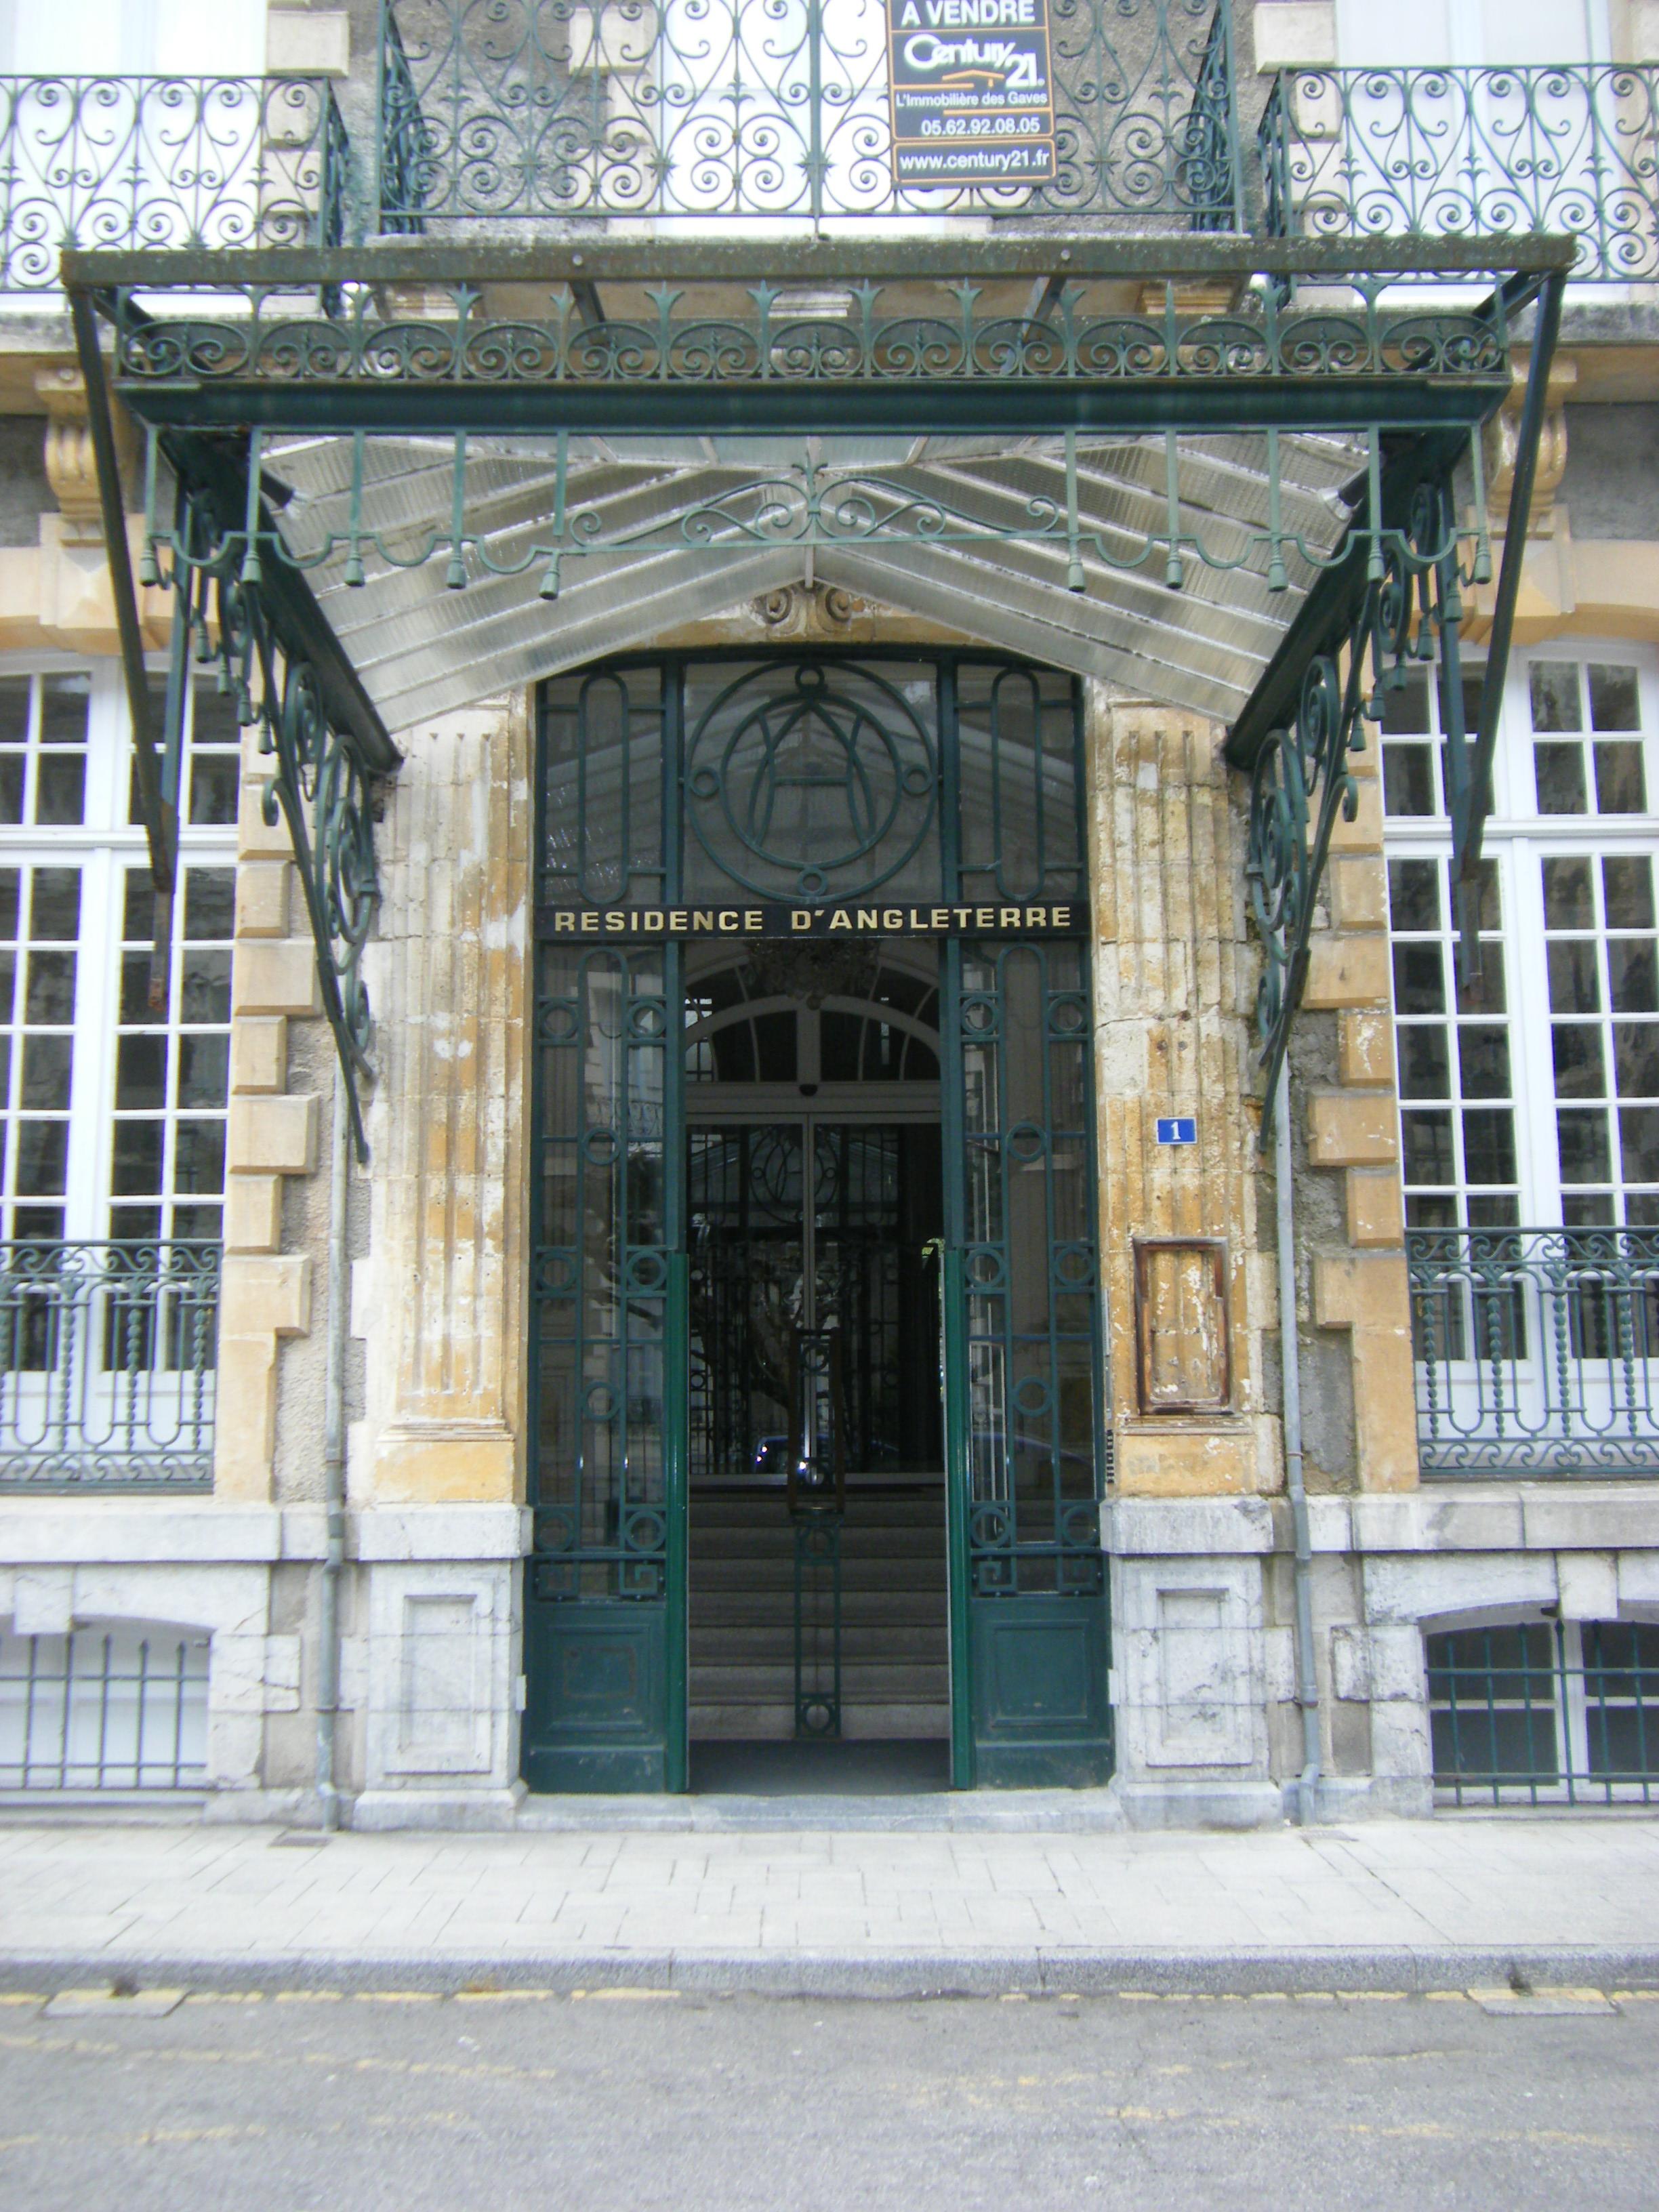 19th century hotel (Cauterets)